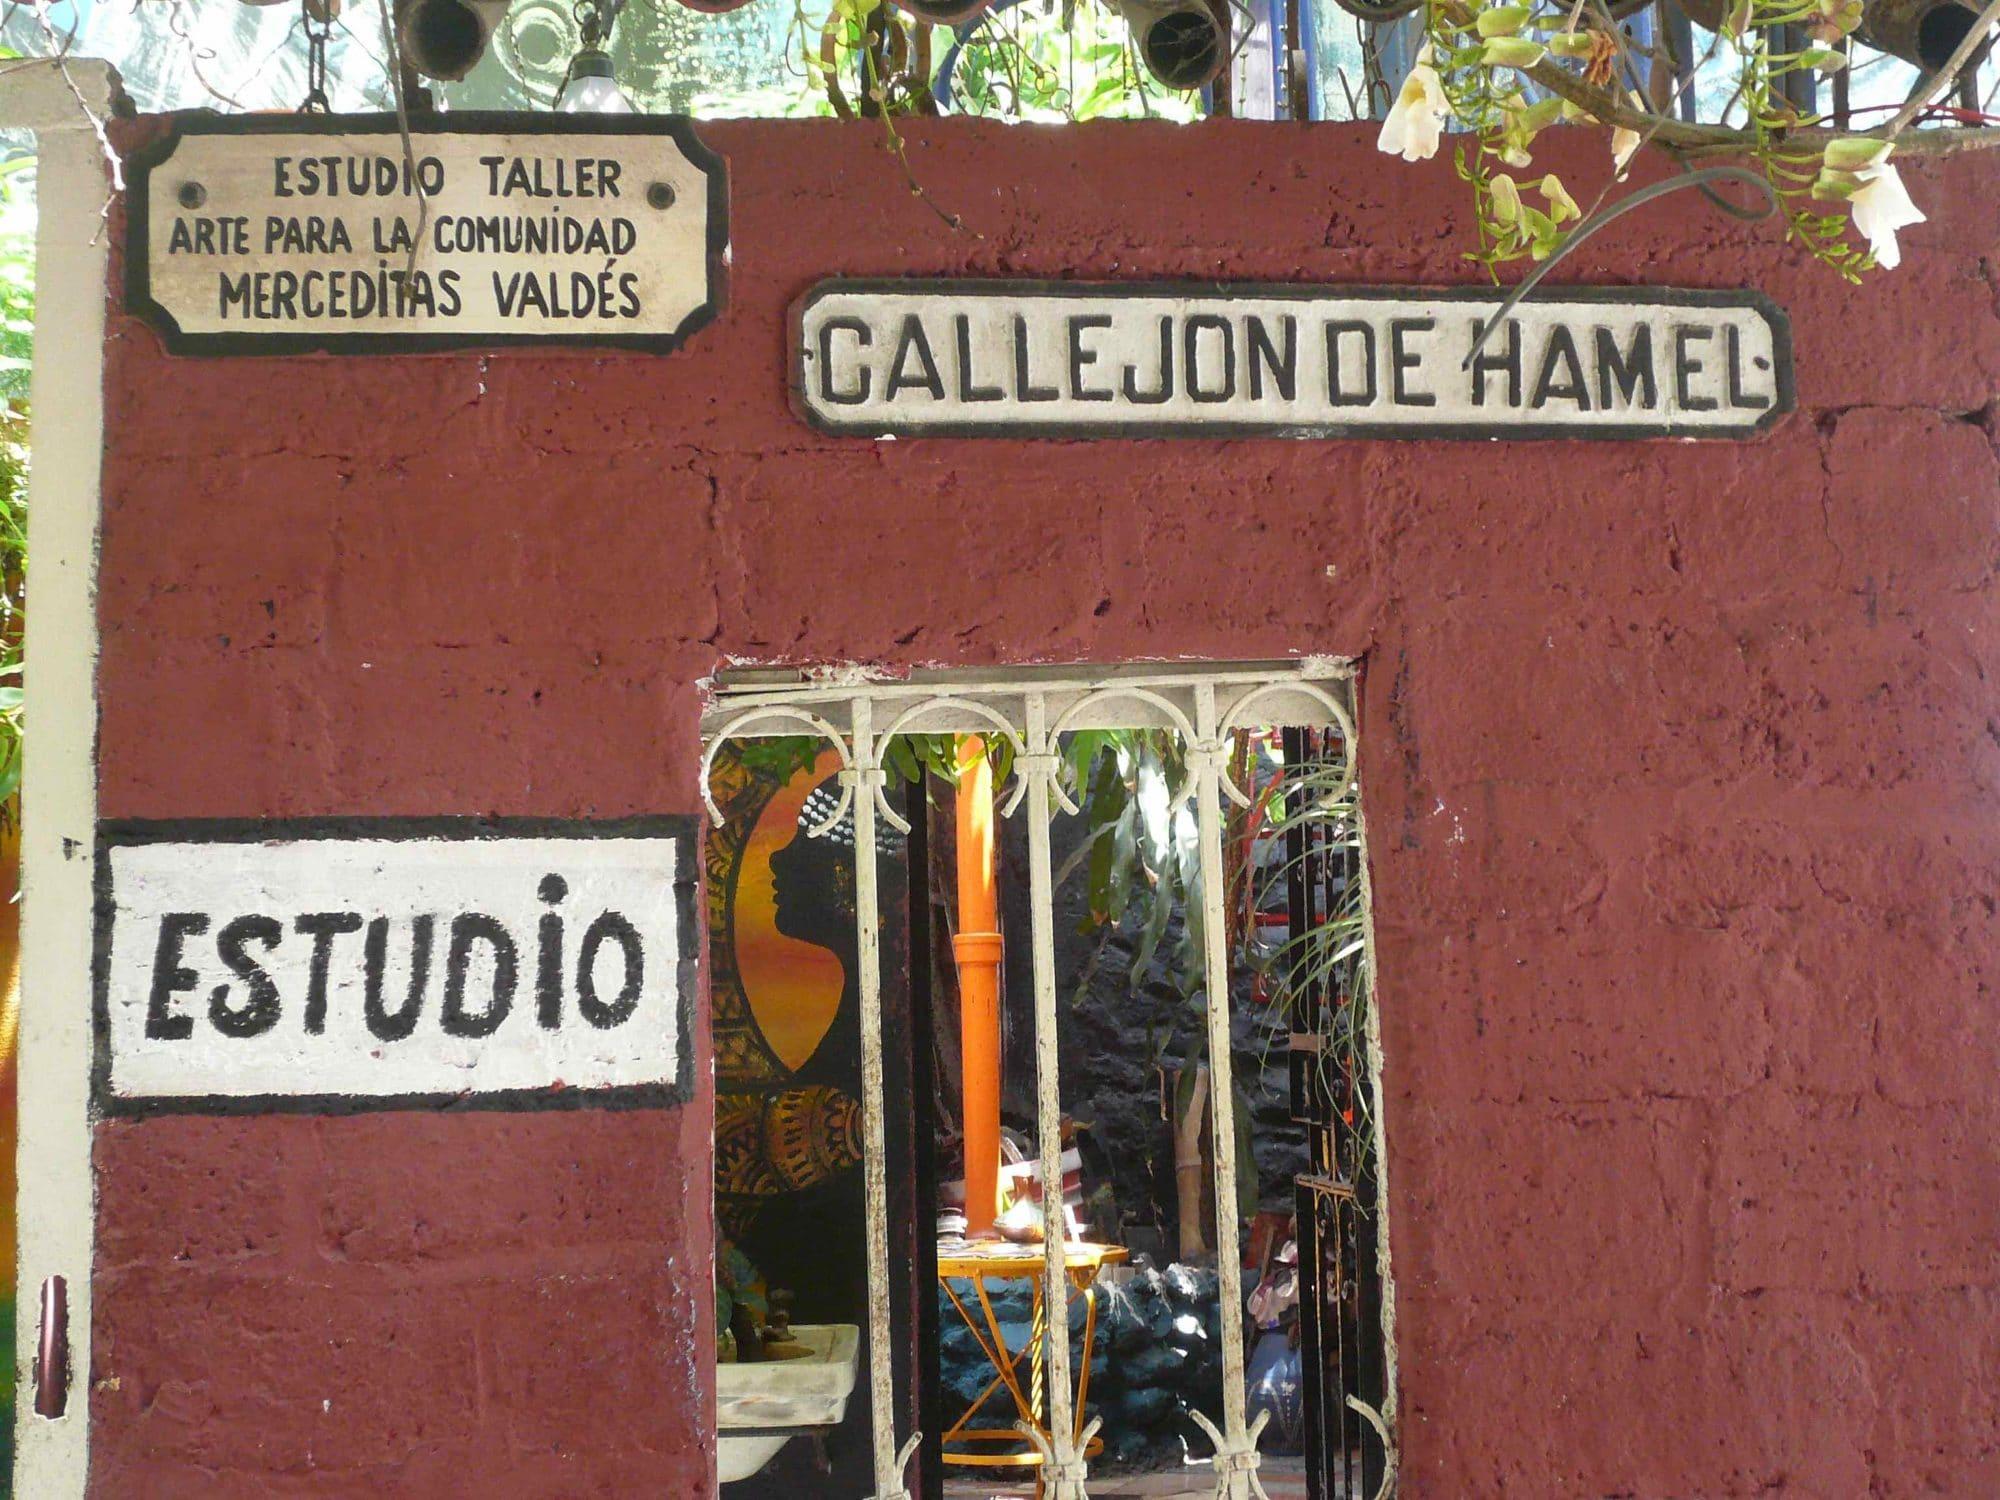 Callejón de Hamel